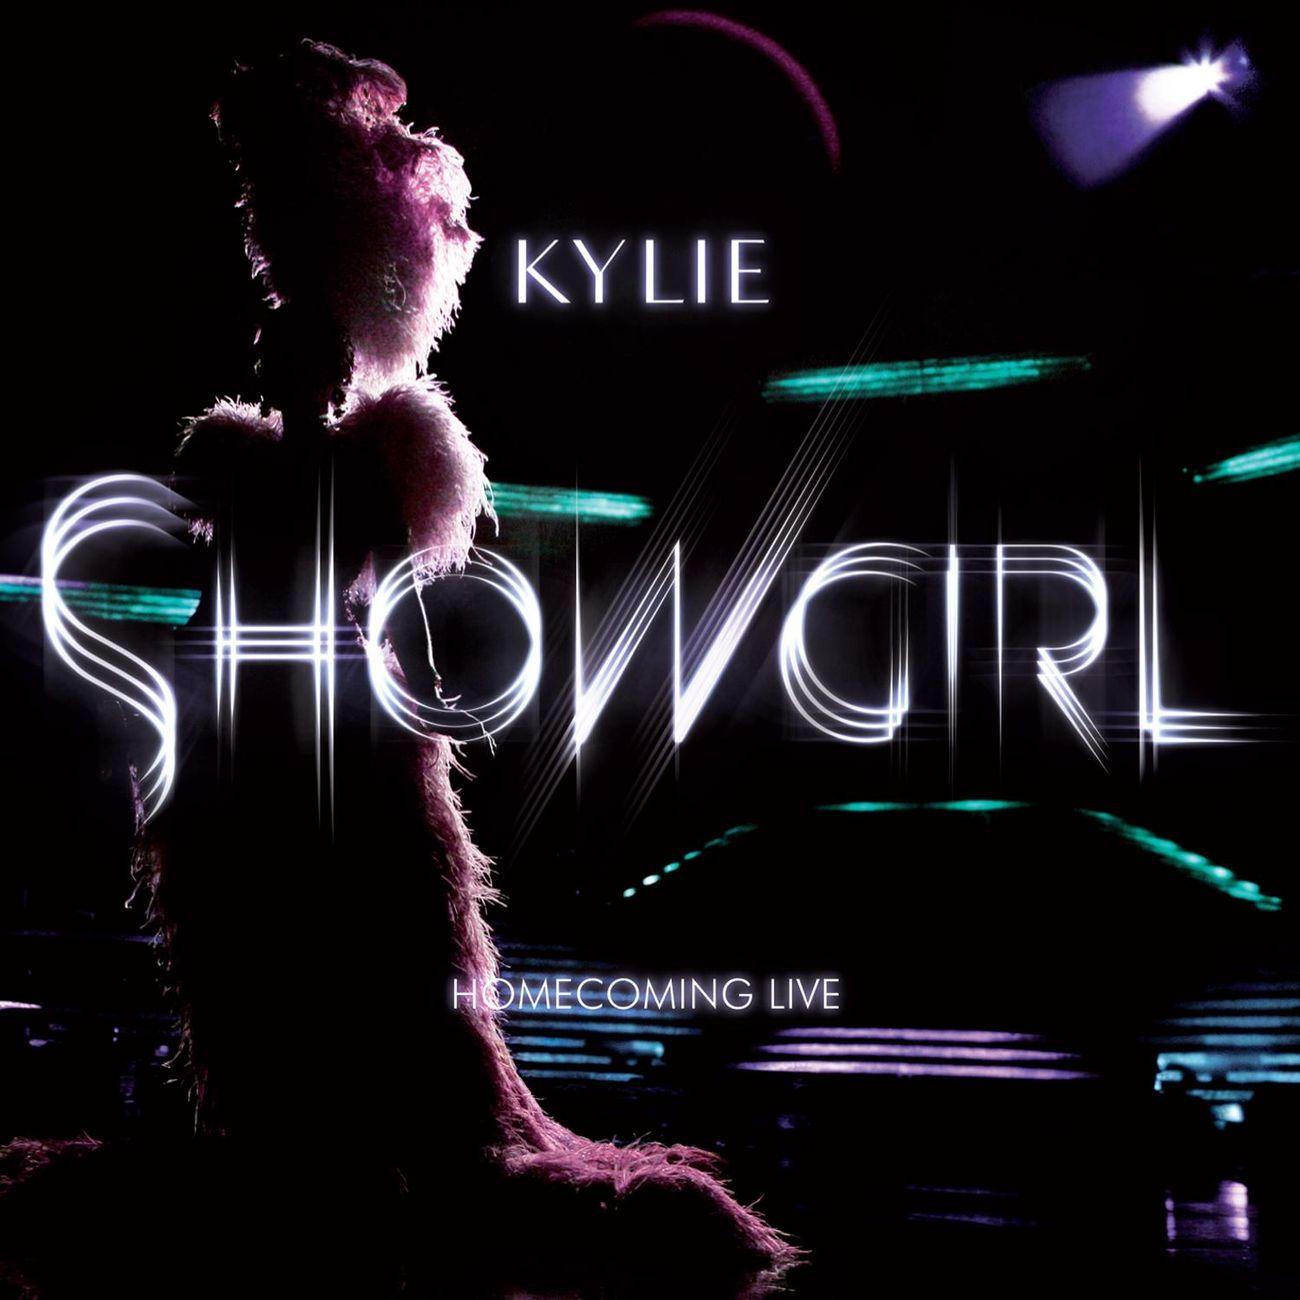 Kylie Minogue - Showgirl - Homecoming Live album cover